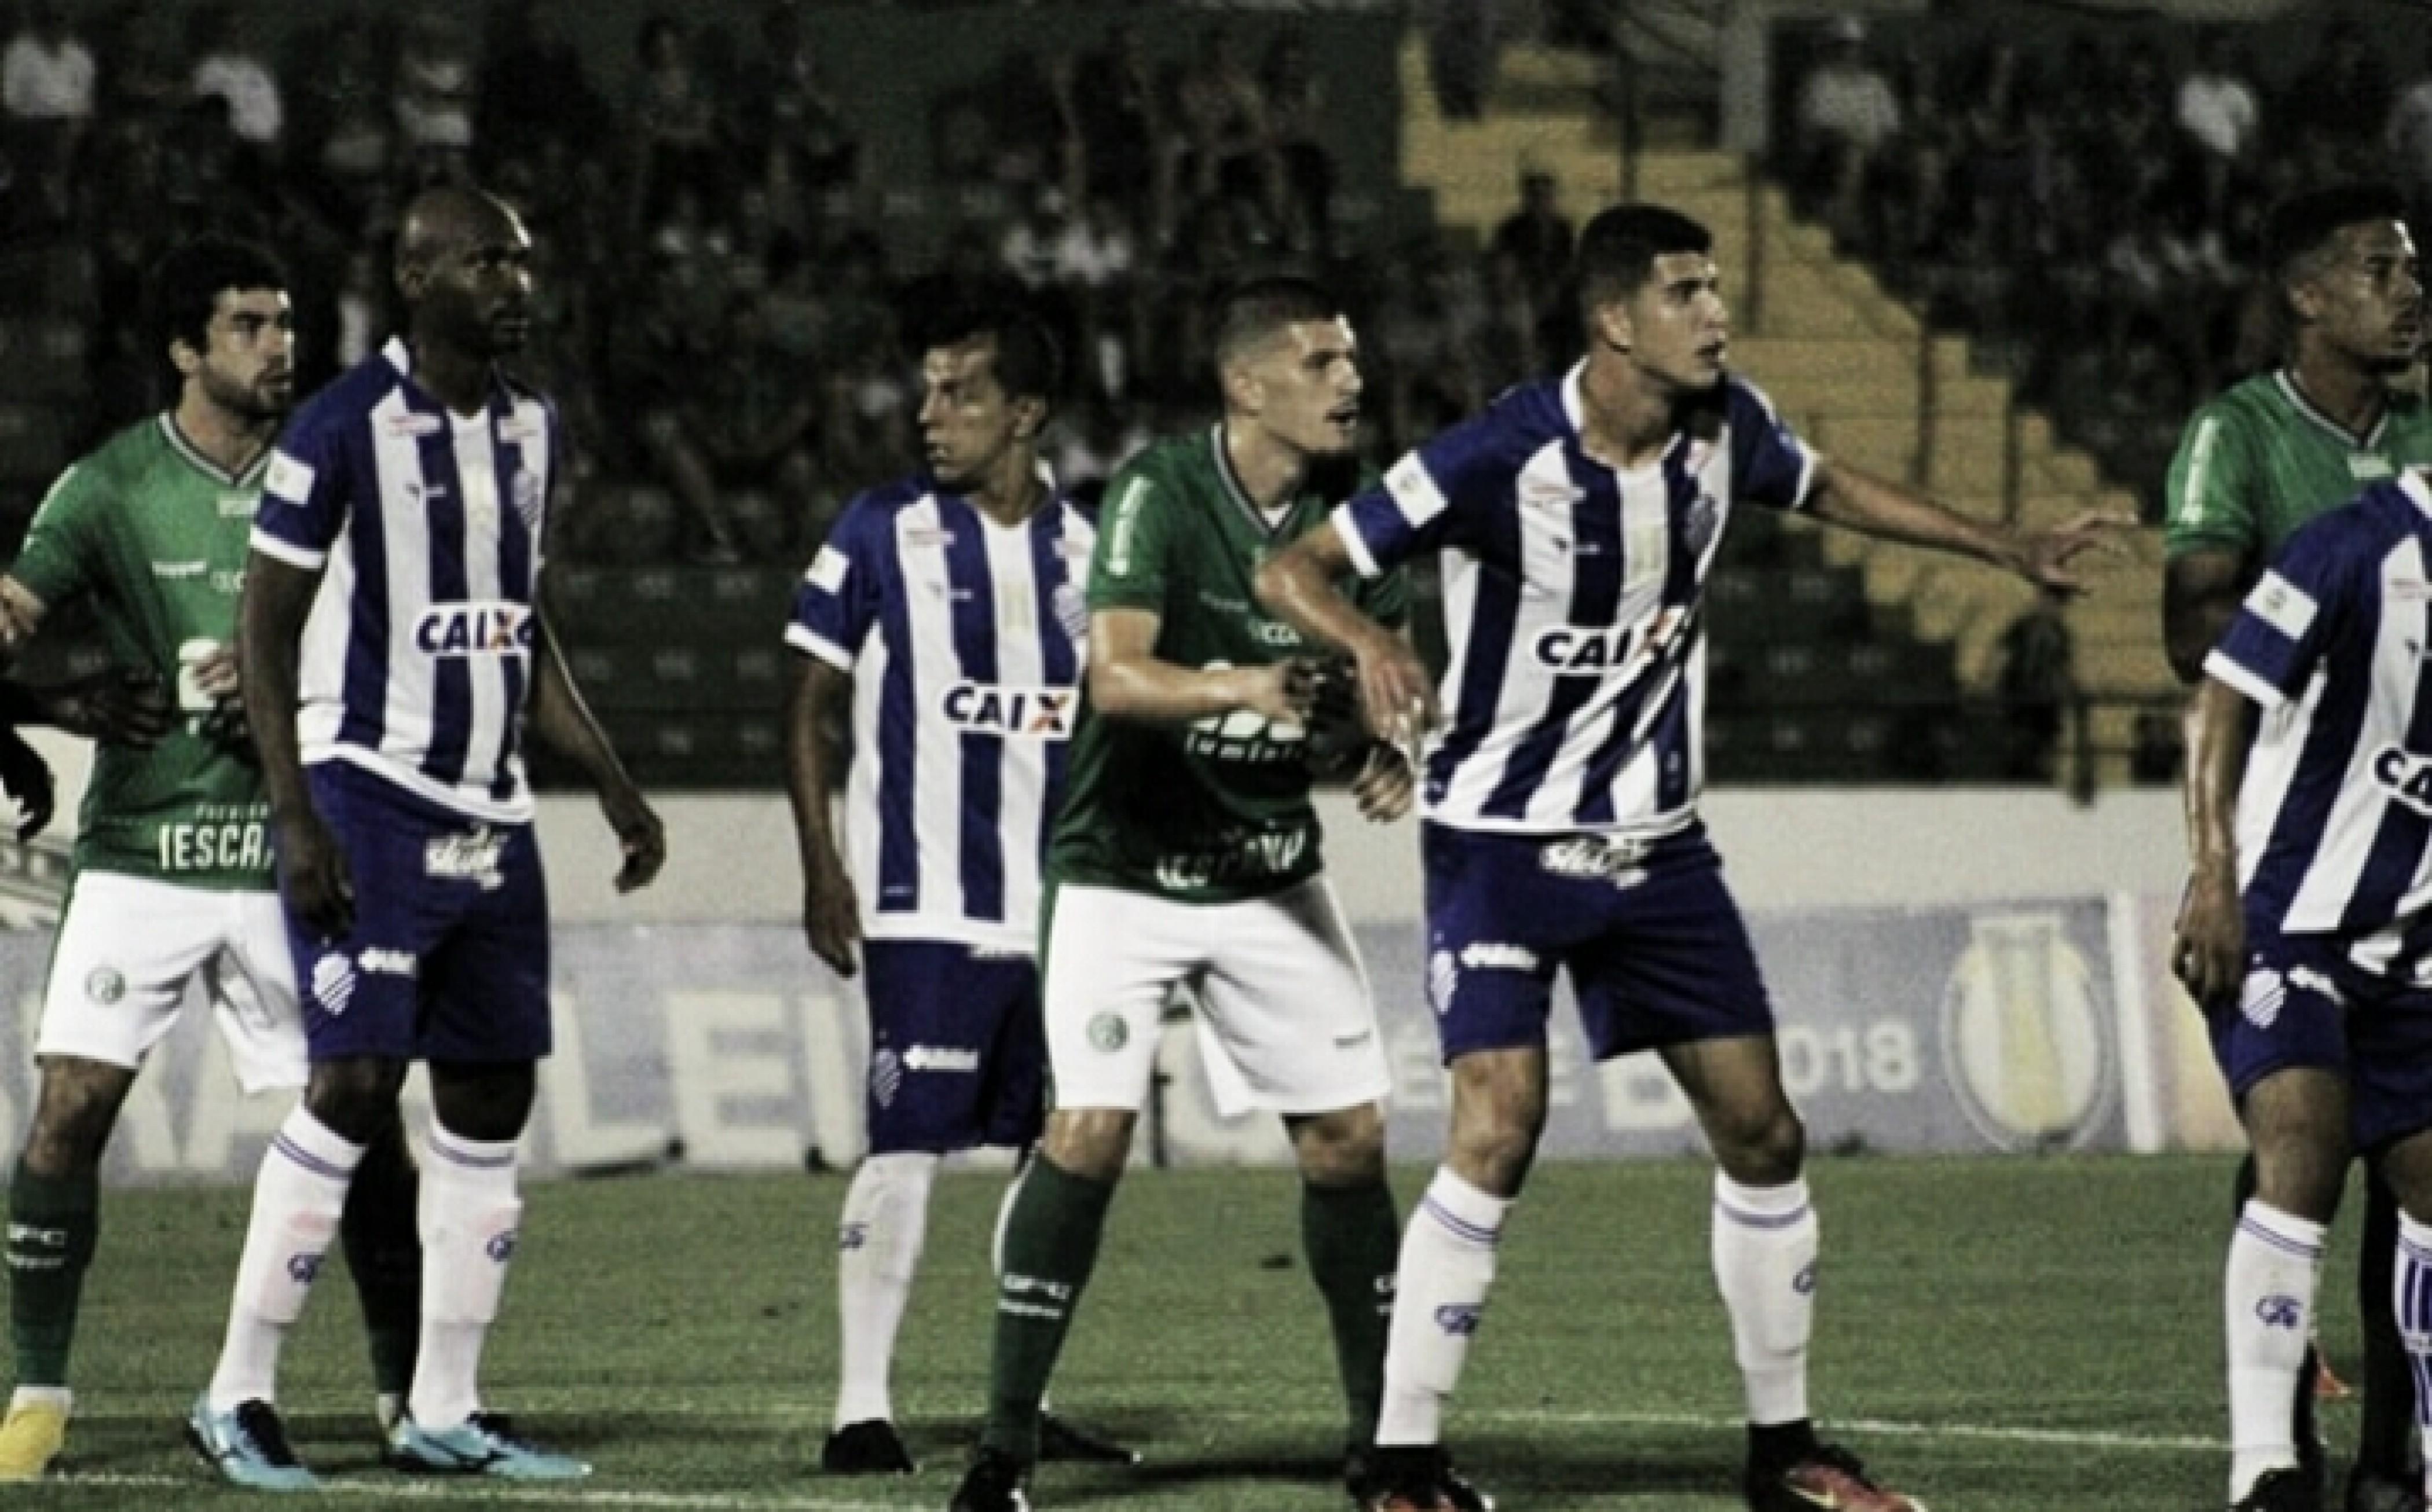 Guarani vence CSA e torce contra Avaí para se manter no G-4